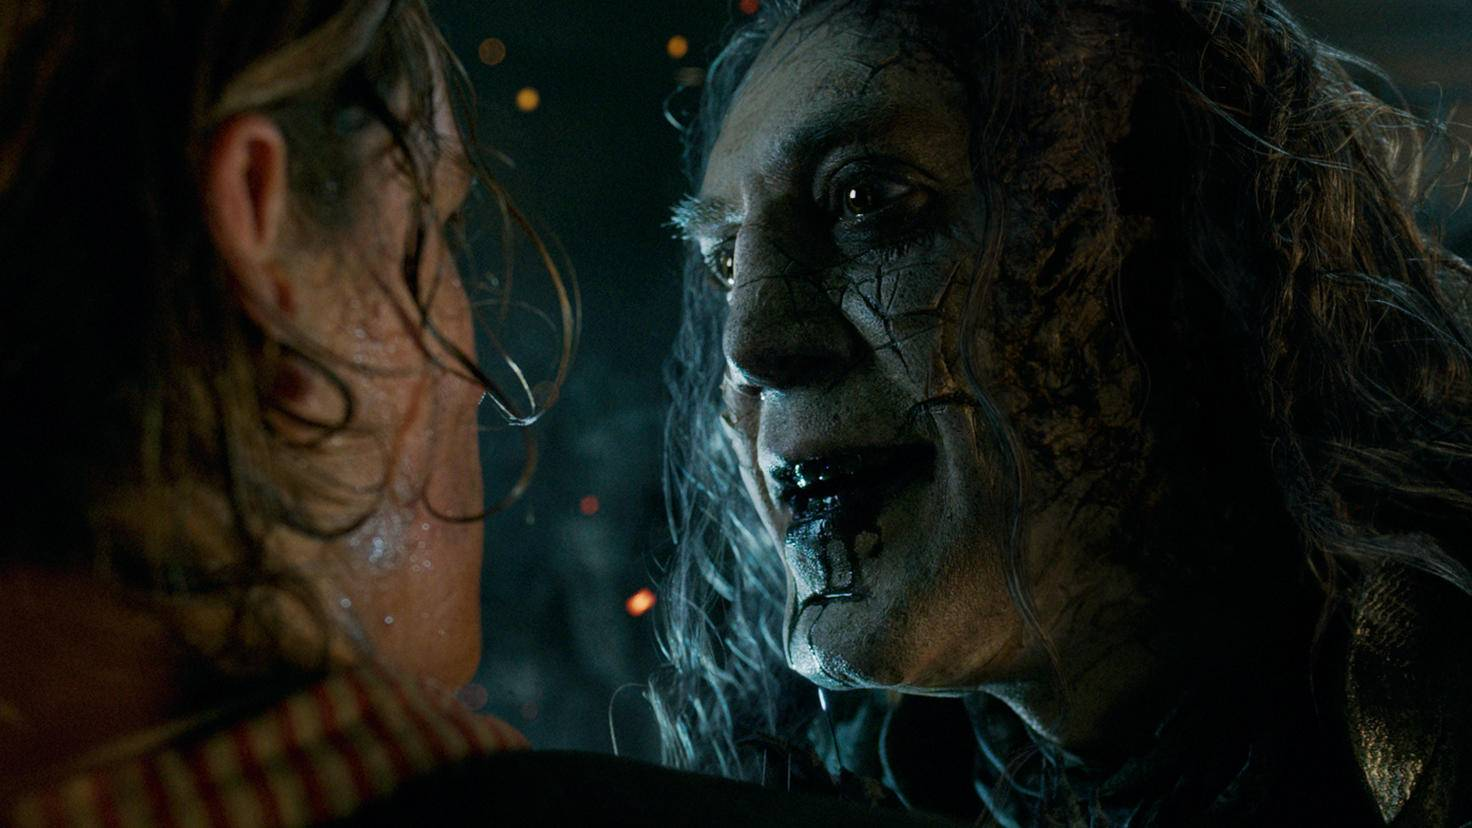 Captain Salazar (Javier Bardem, rechts) macht Jagd auf Jack Sparrow (Johnny Depp)